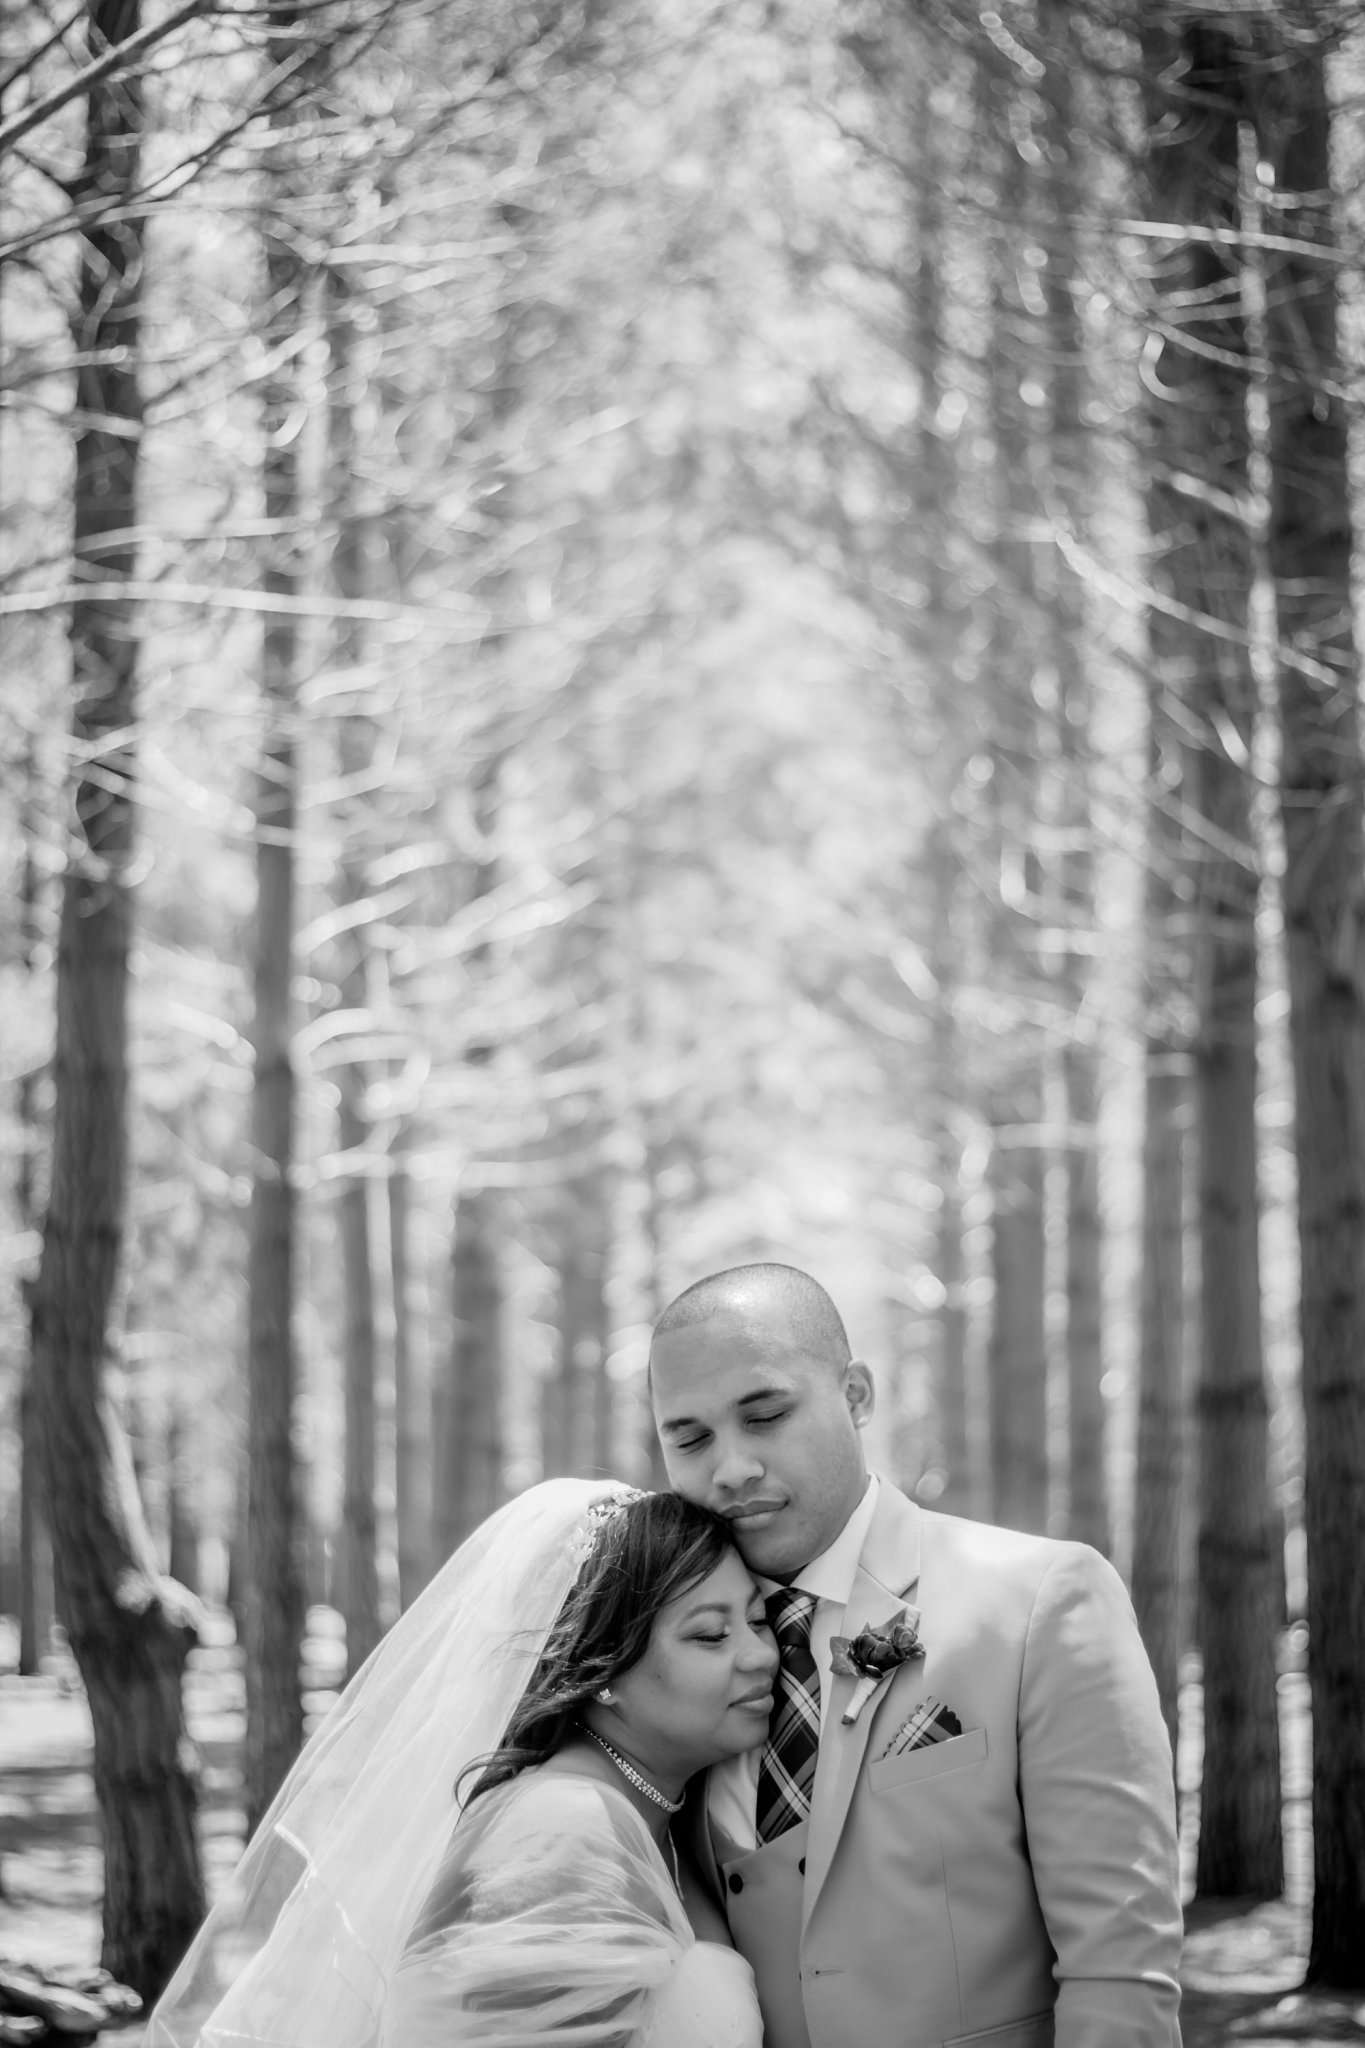 KEENAN & HAYLEY WEDDING | HOUTBAY MANOR